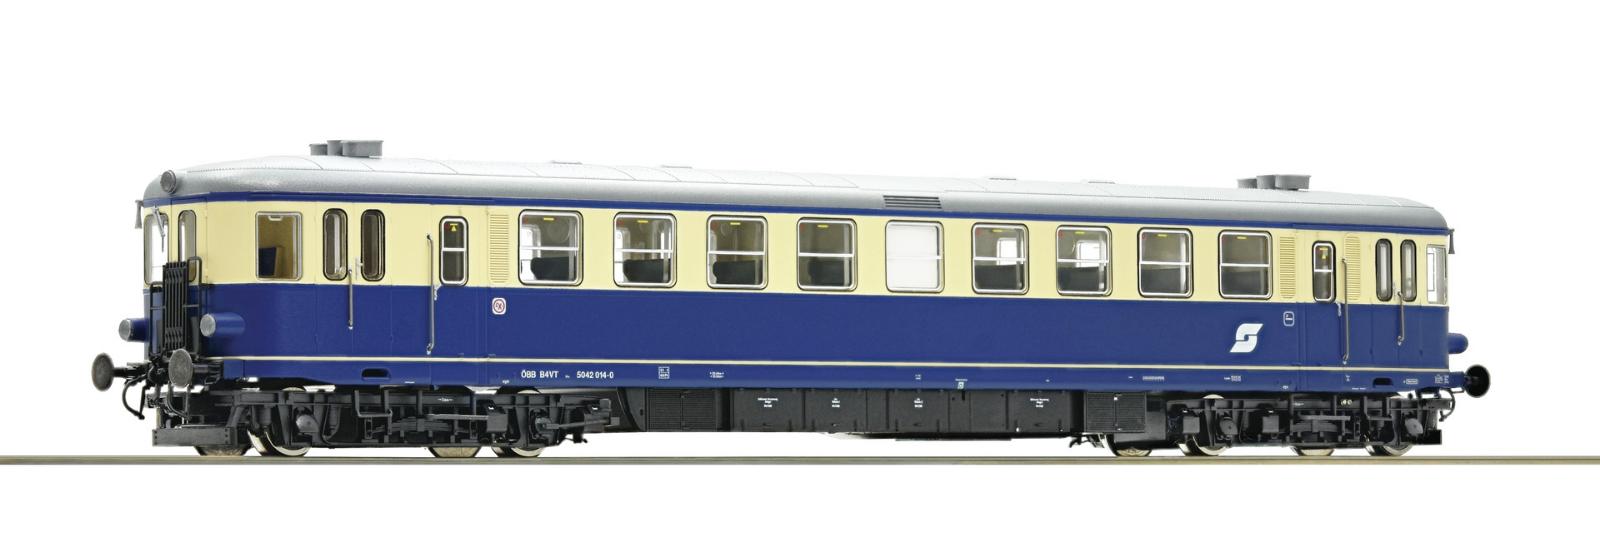 Roco HO Scale Diesel railcar serie 5042 014 OBB